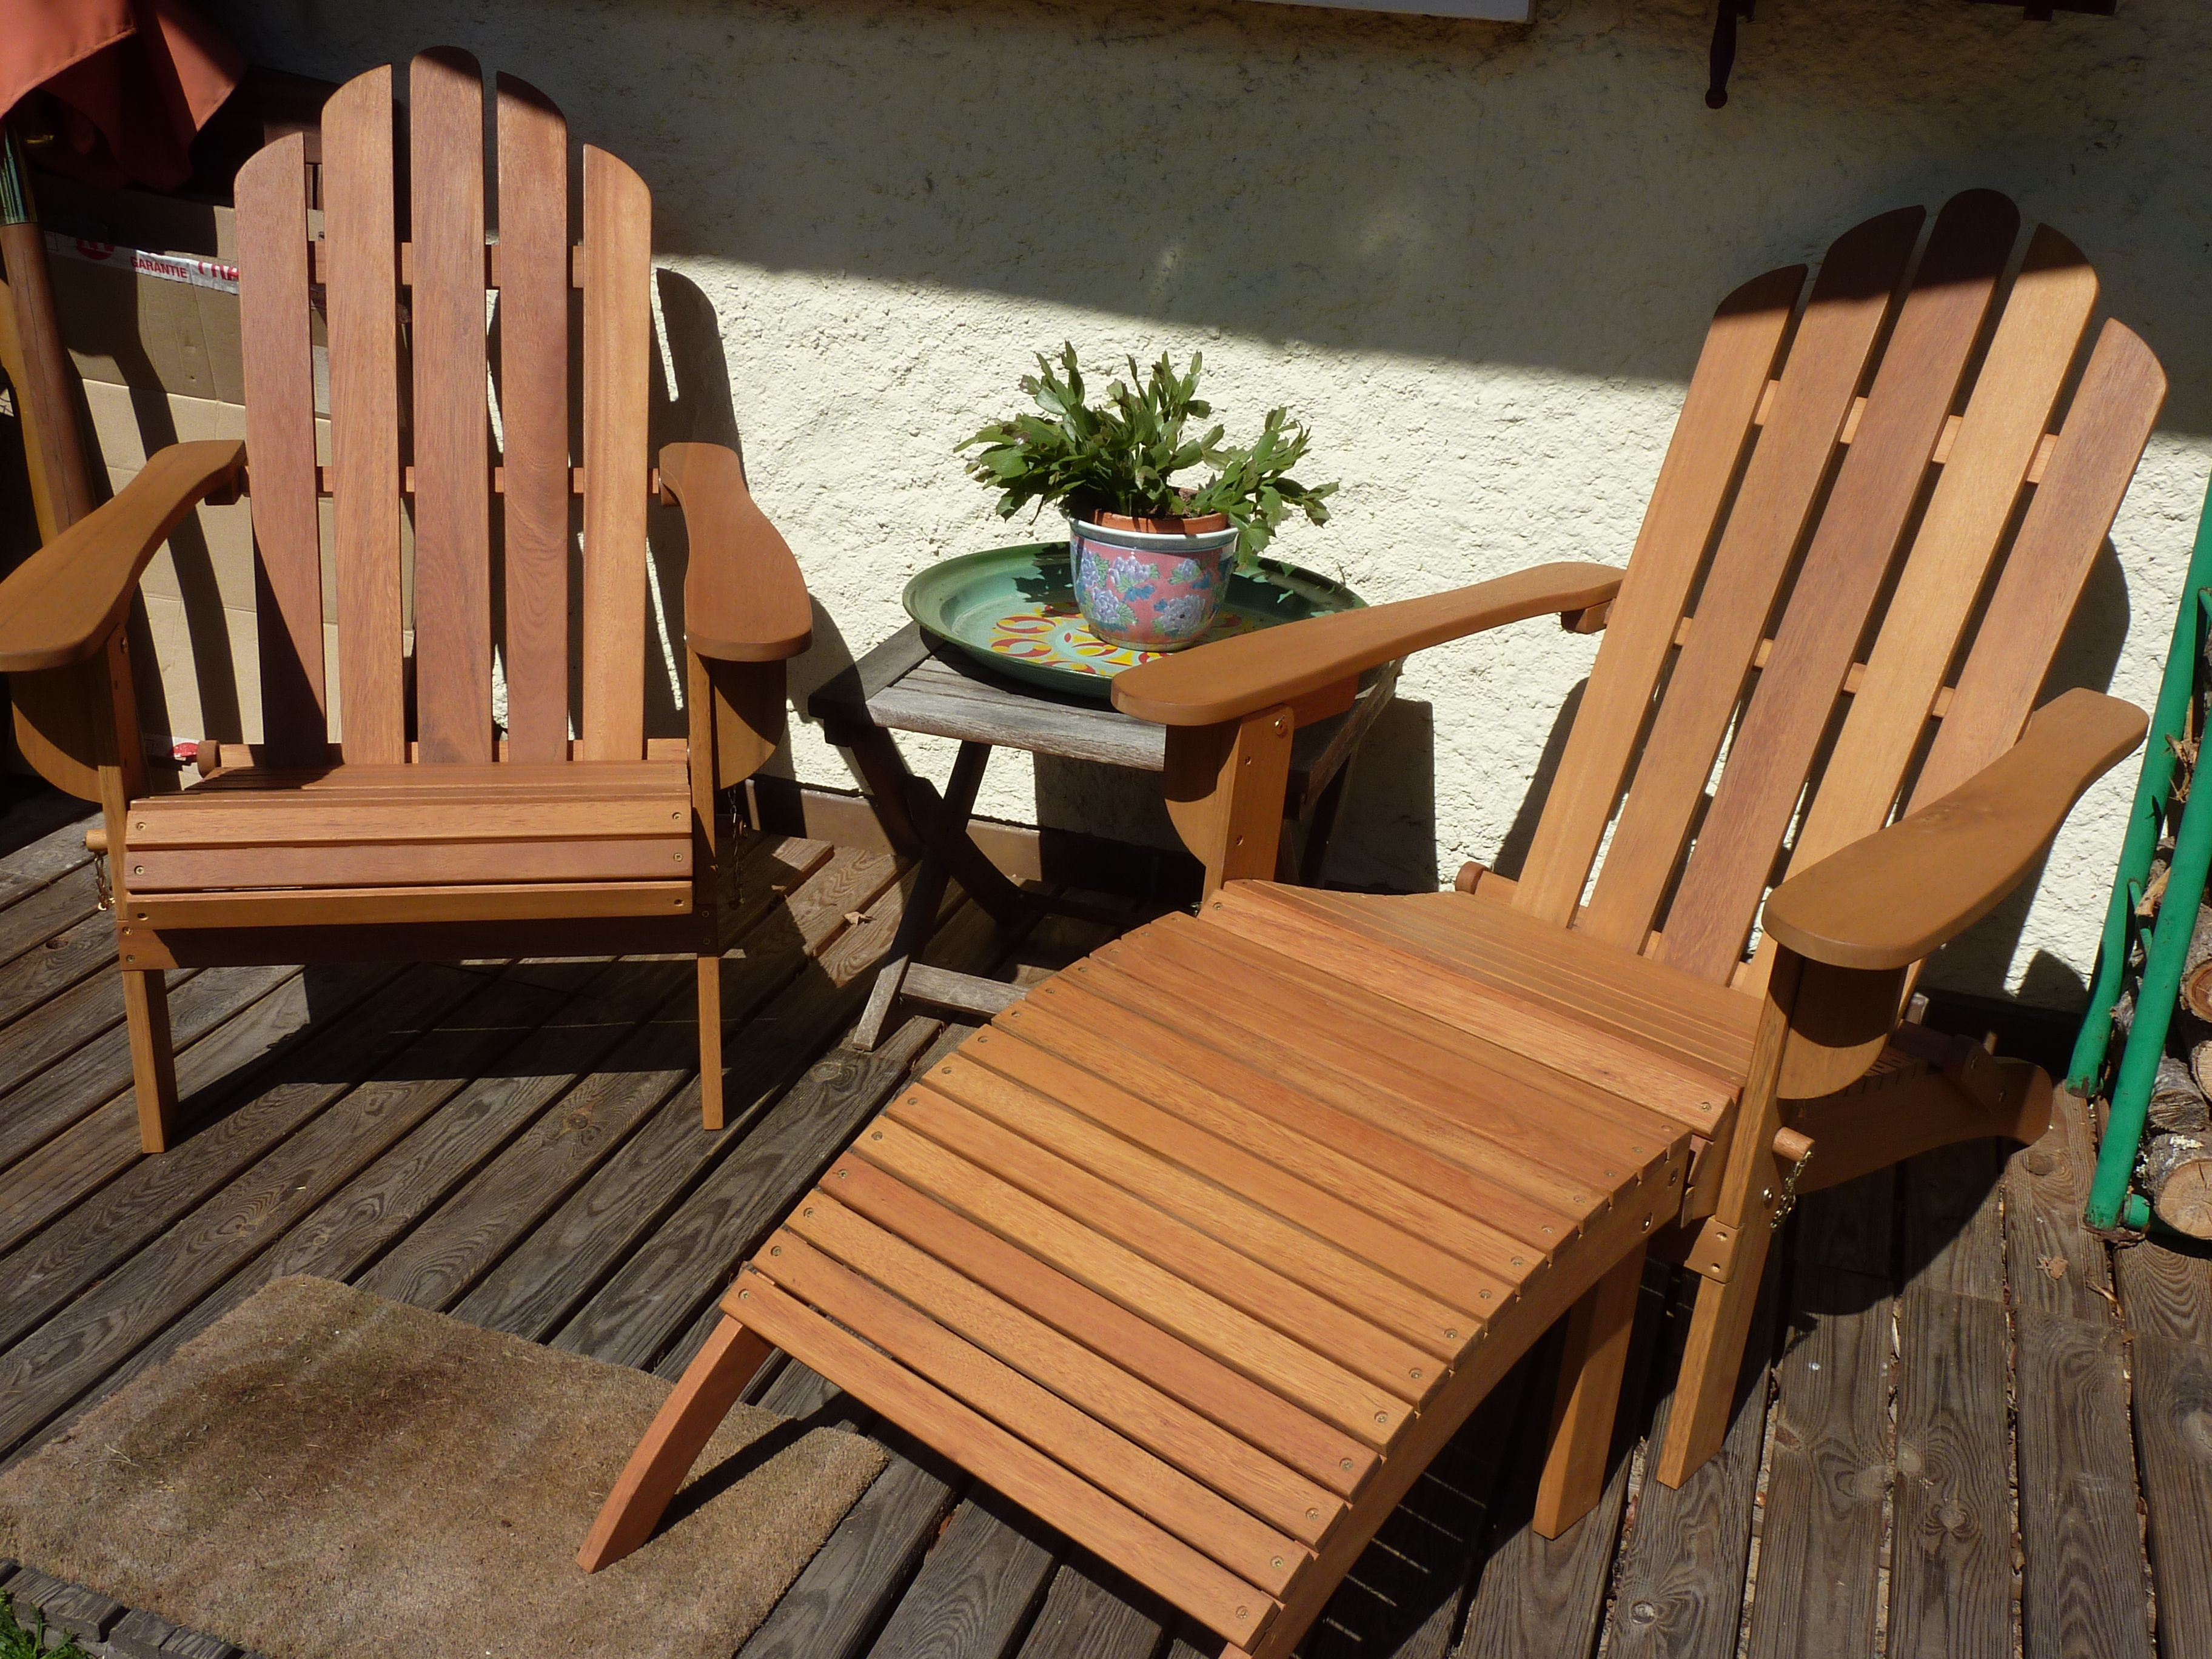 Adirondack : fauteuil de jardin en bois eucalyptus FSC style rétro ...